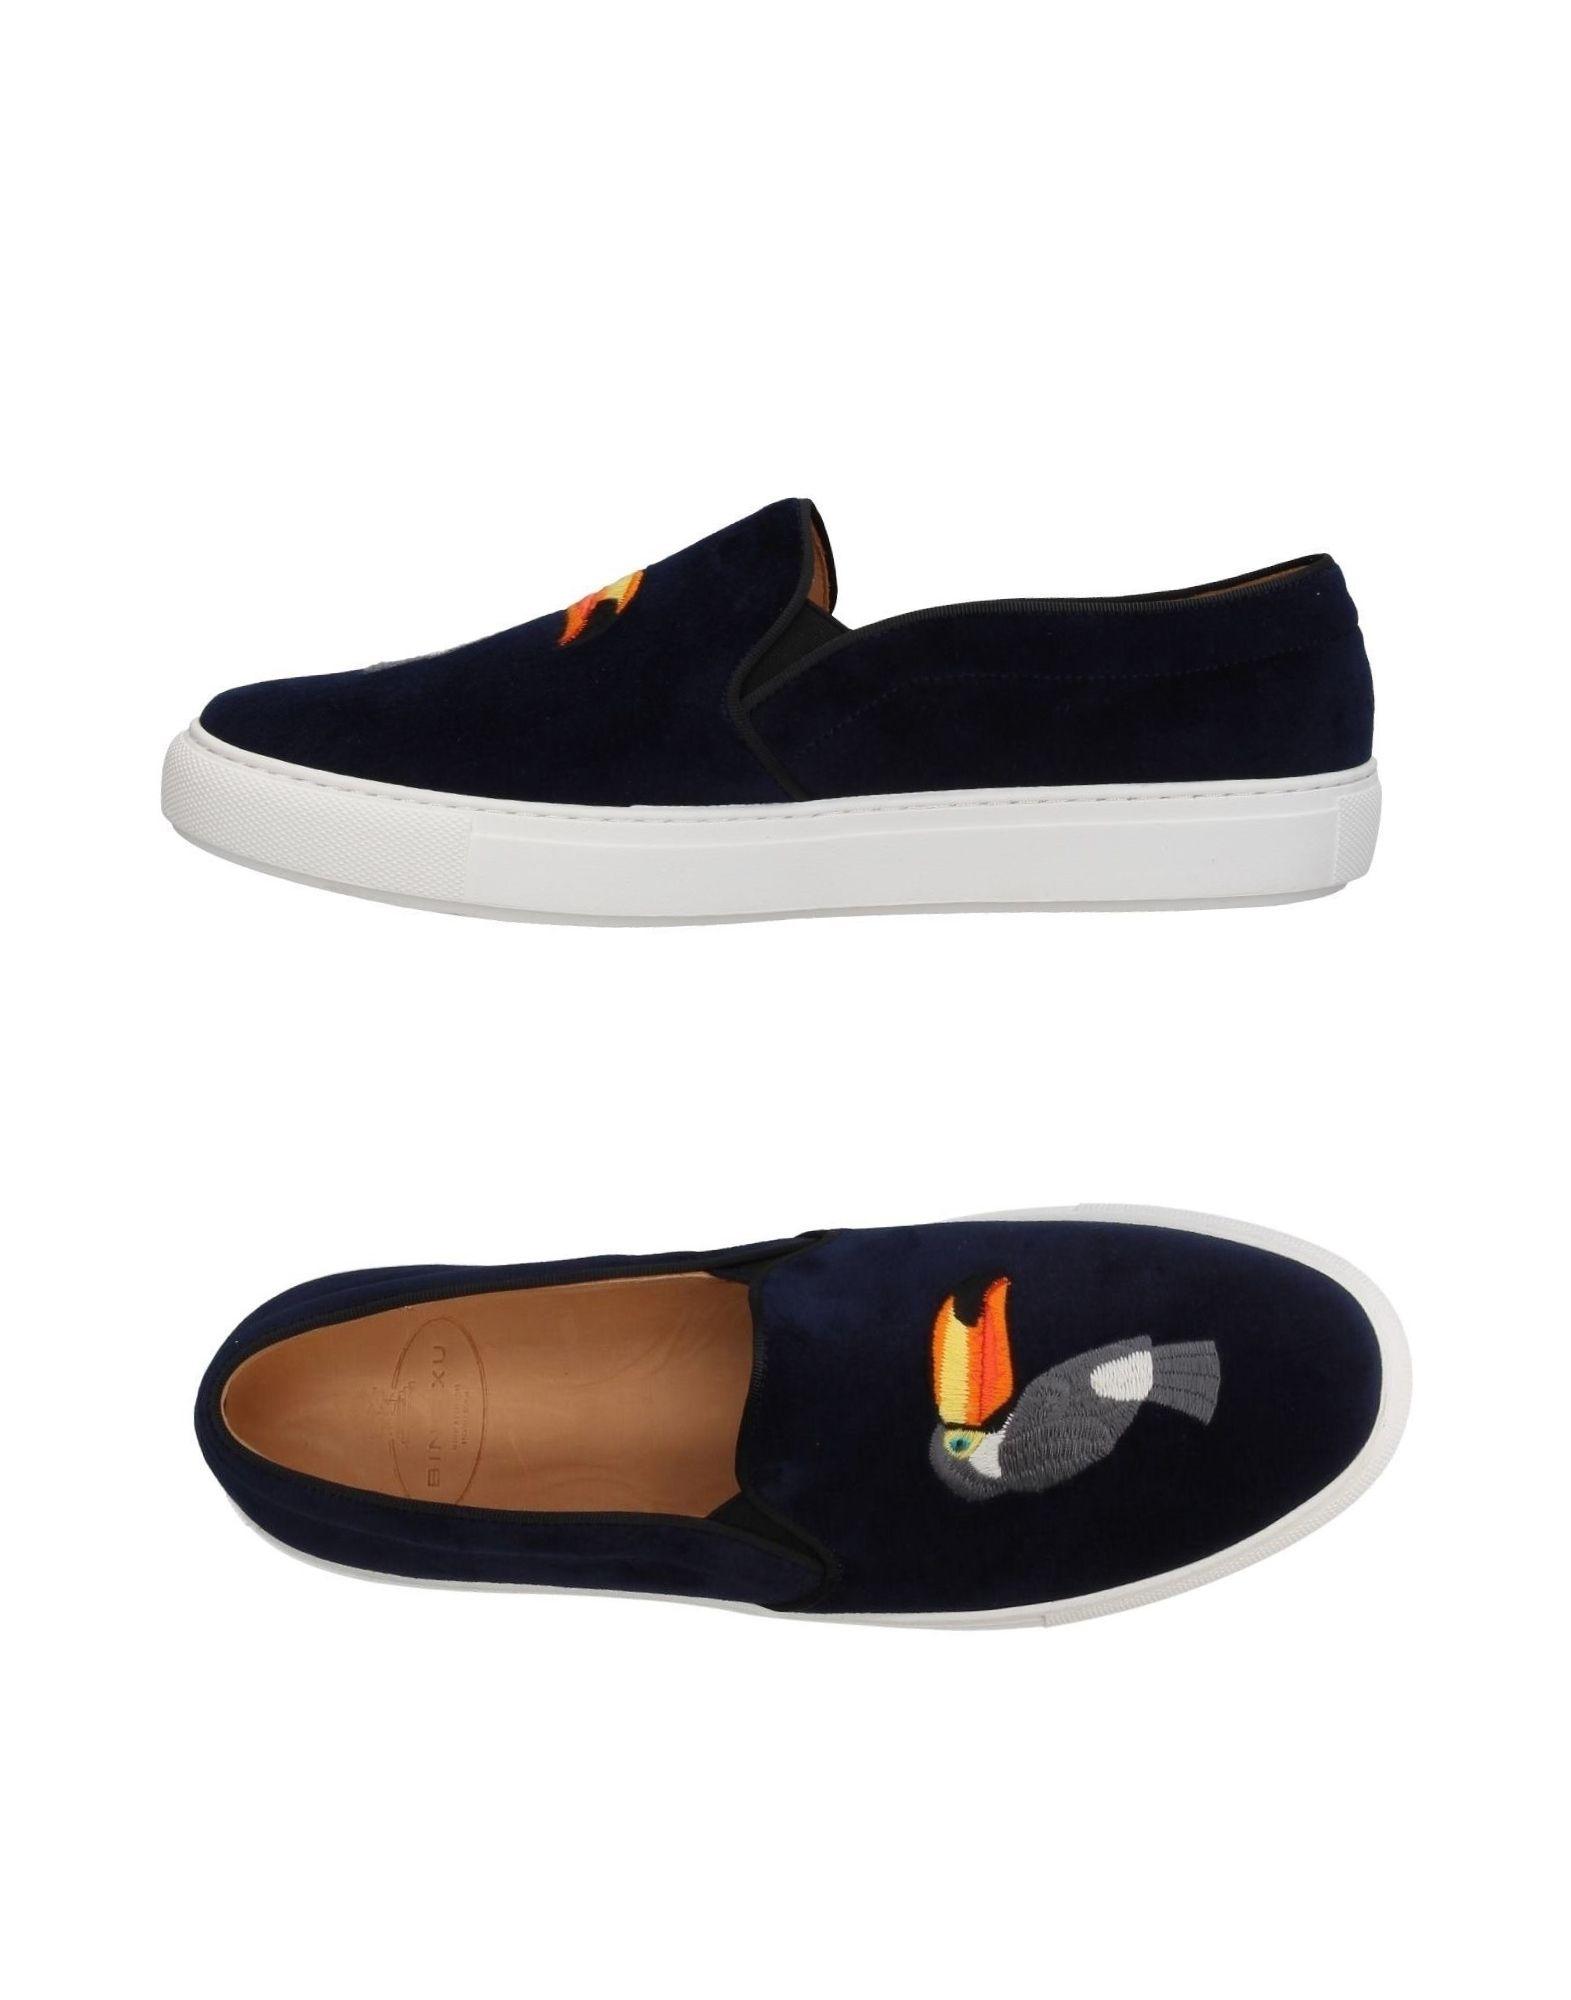 Sneakers Bing Xu Uomo - 11392945WR